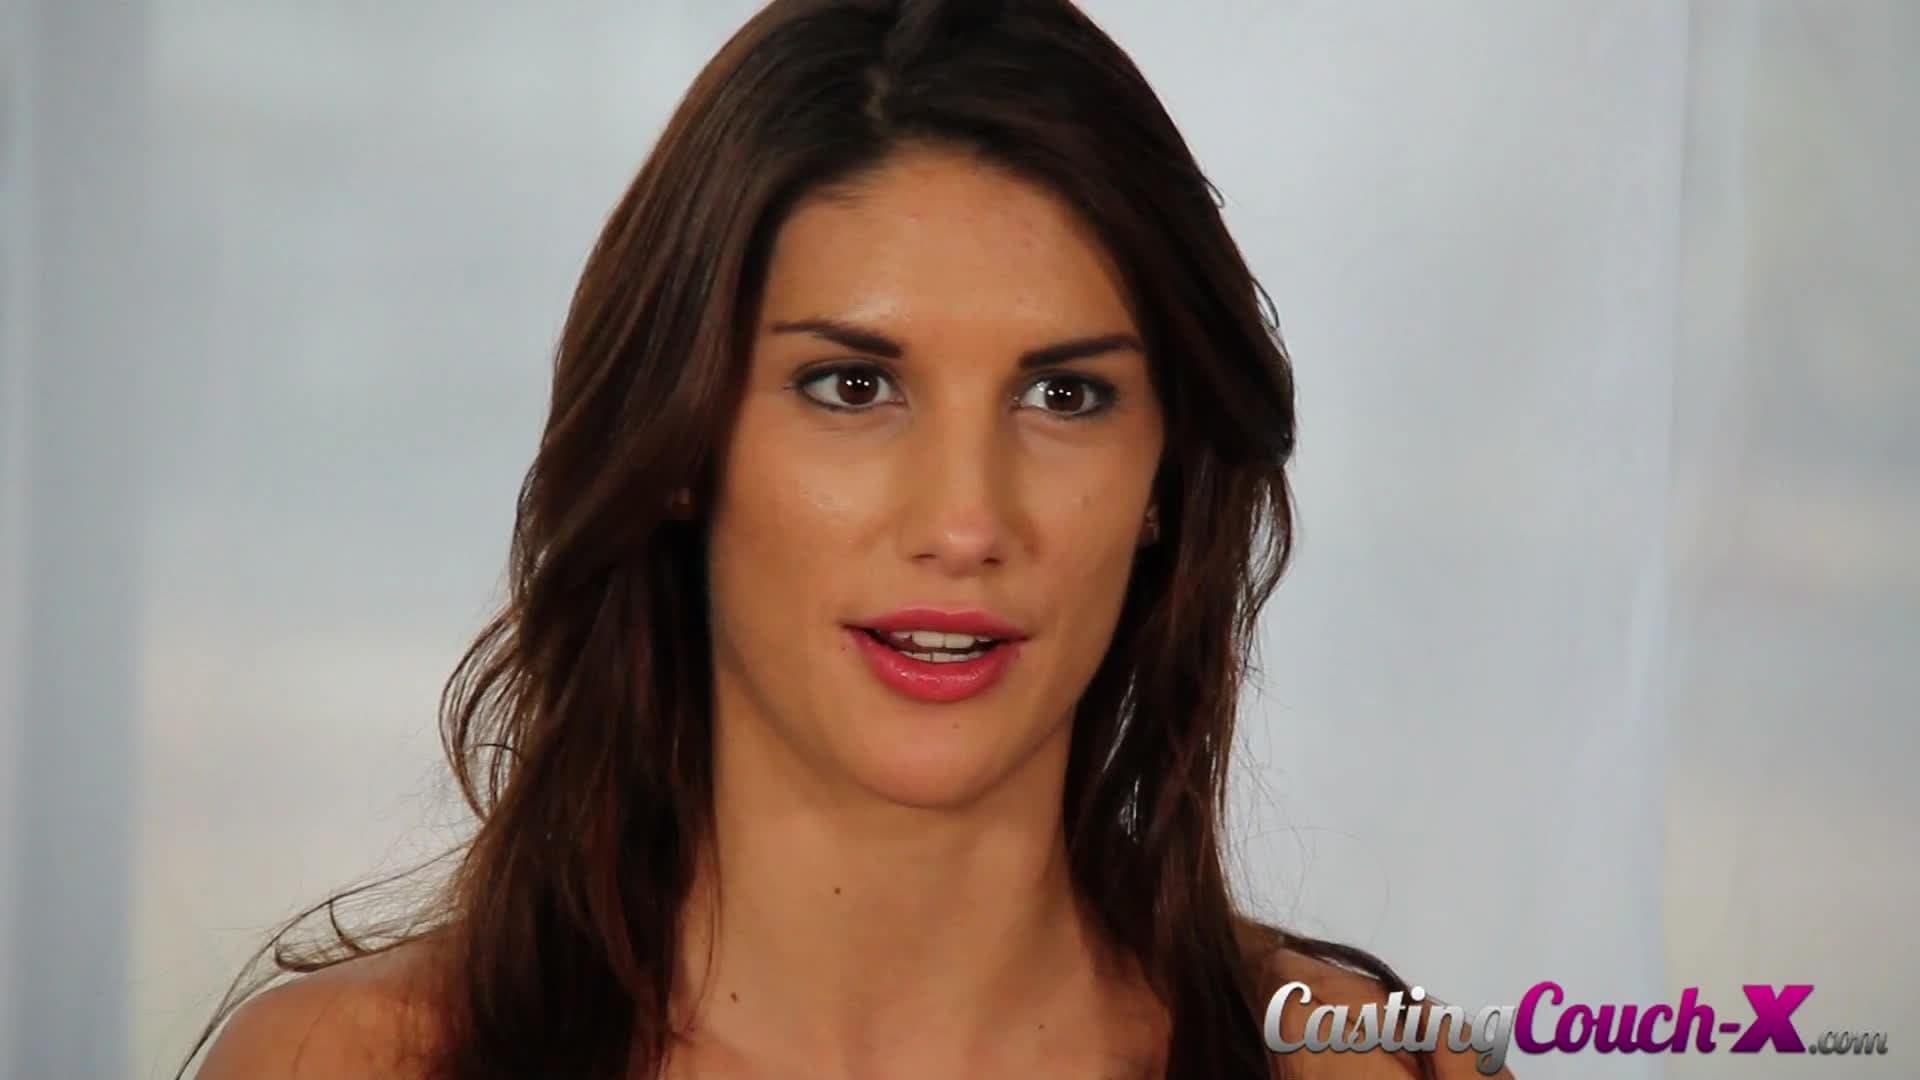 August Ames Video Porno august ames: casting an insatiable brunette - porndig